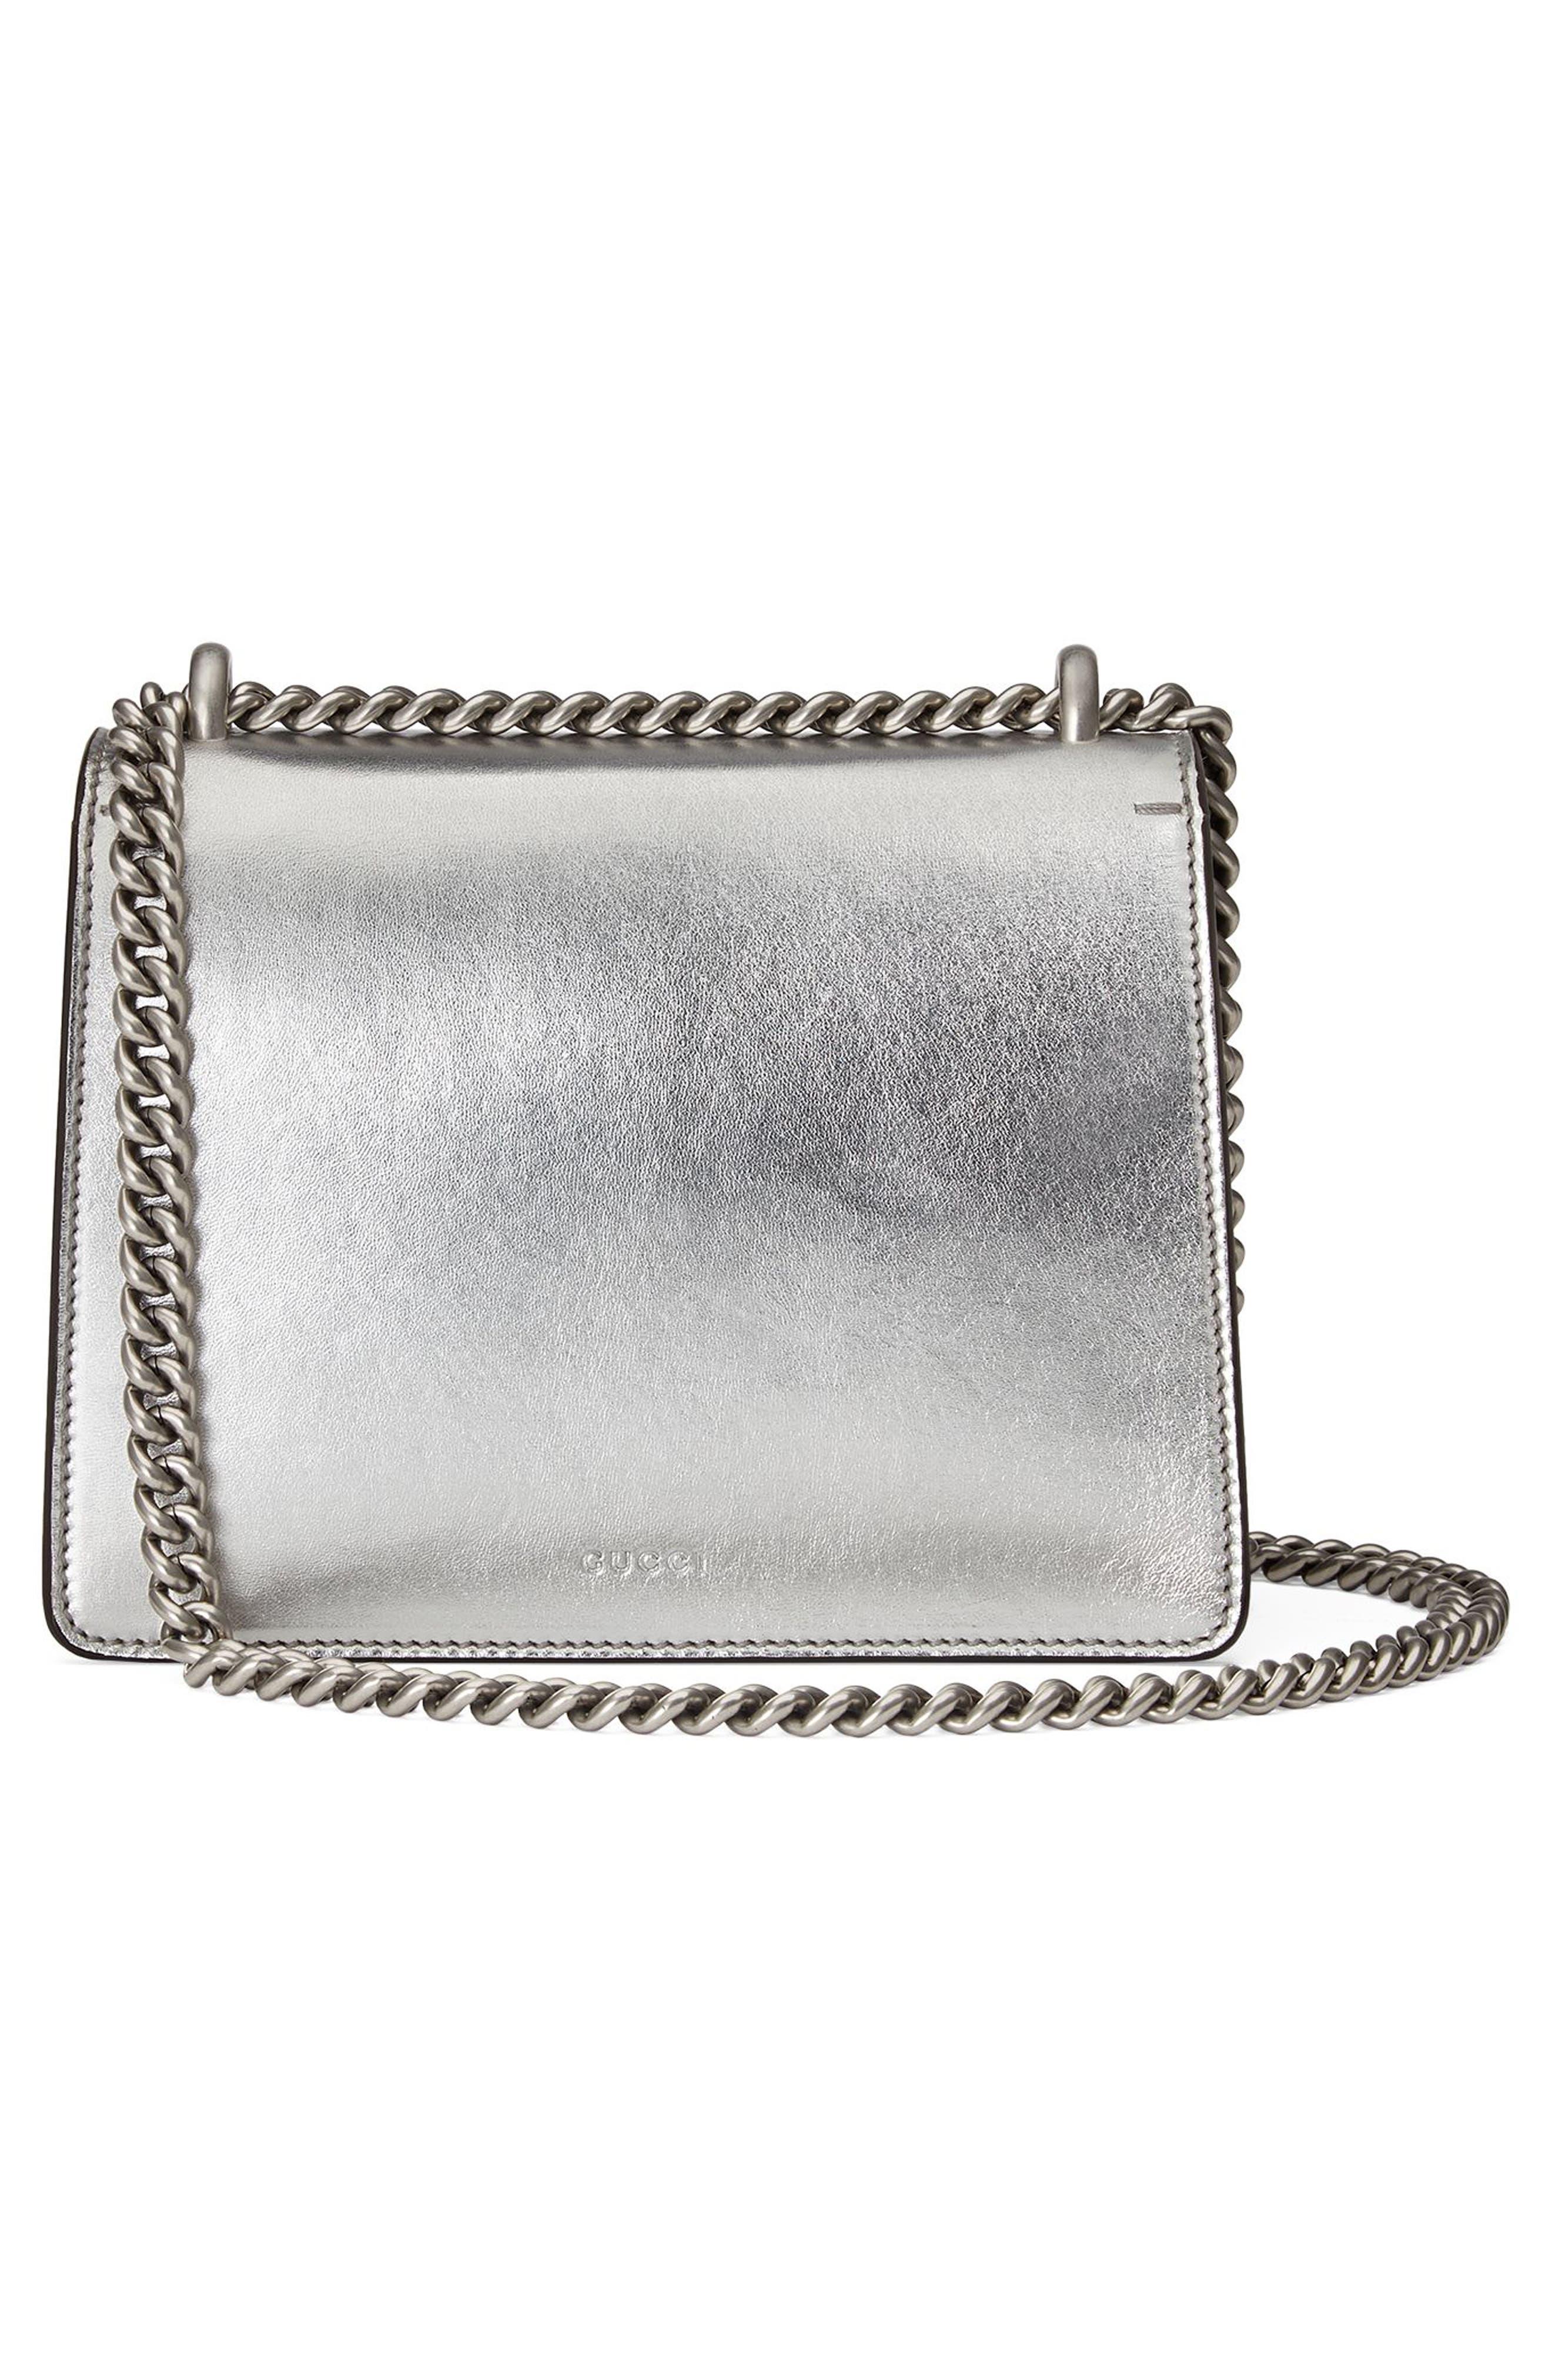 Alternate Image 2  - Gucci Mini Dionysus Metallic Leather Shoulder Bag